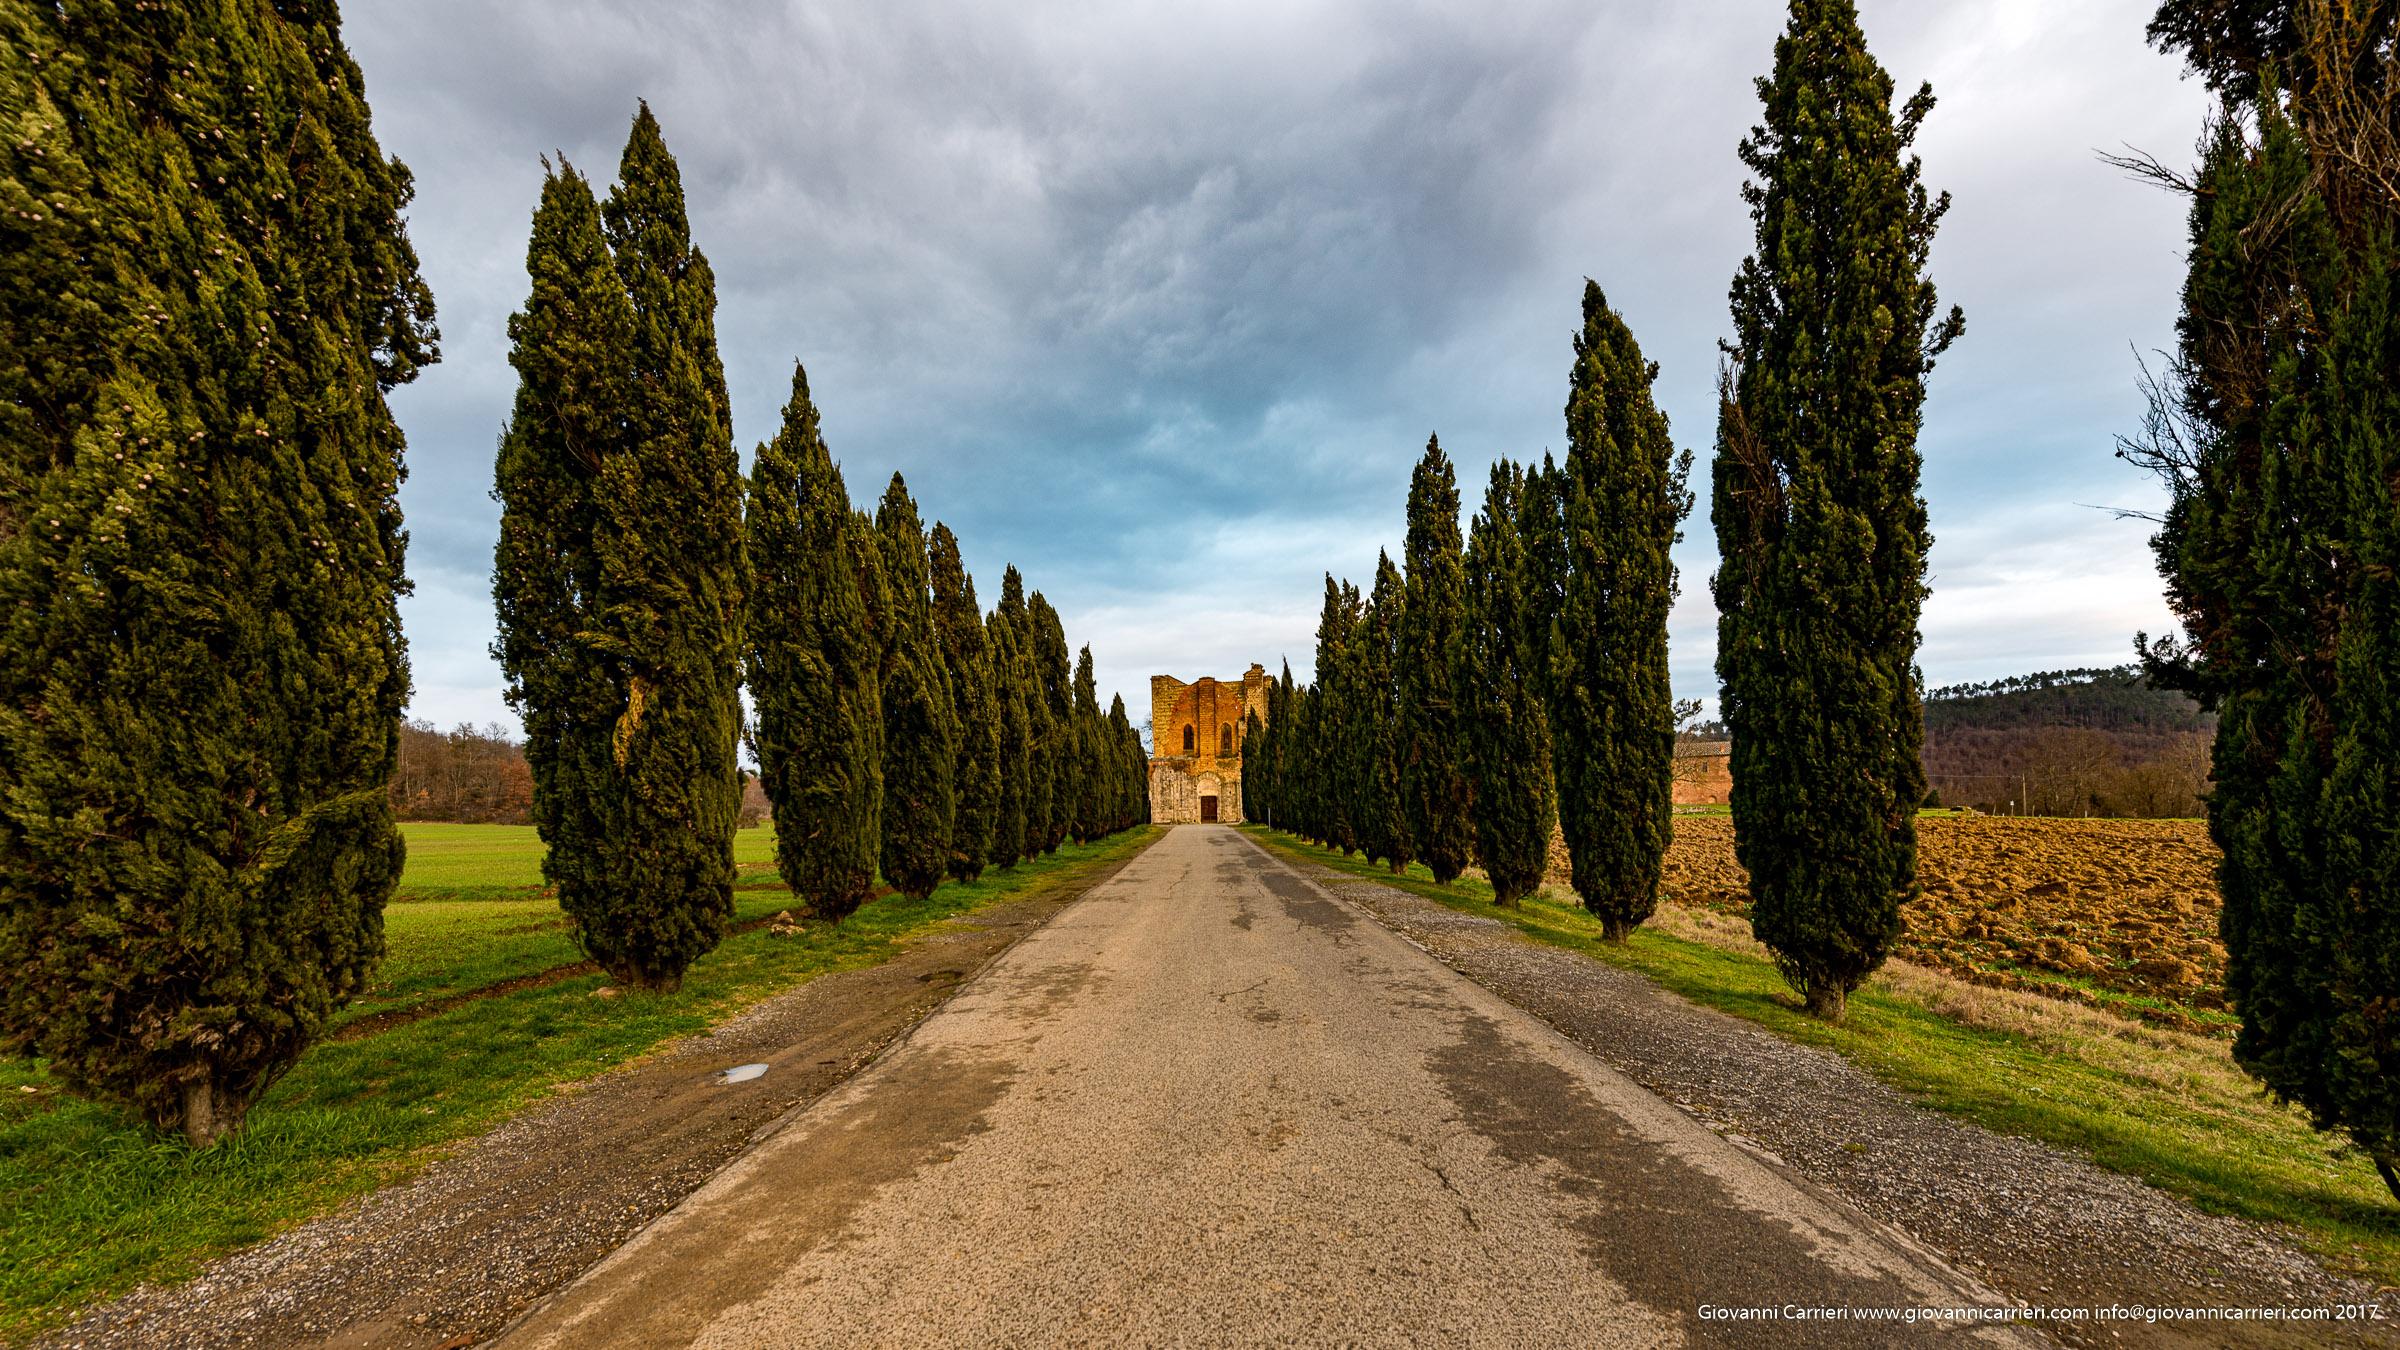 Ruin of San Galgano Abbey and its tree-lined street